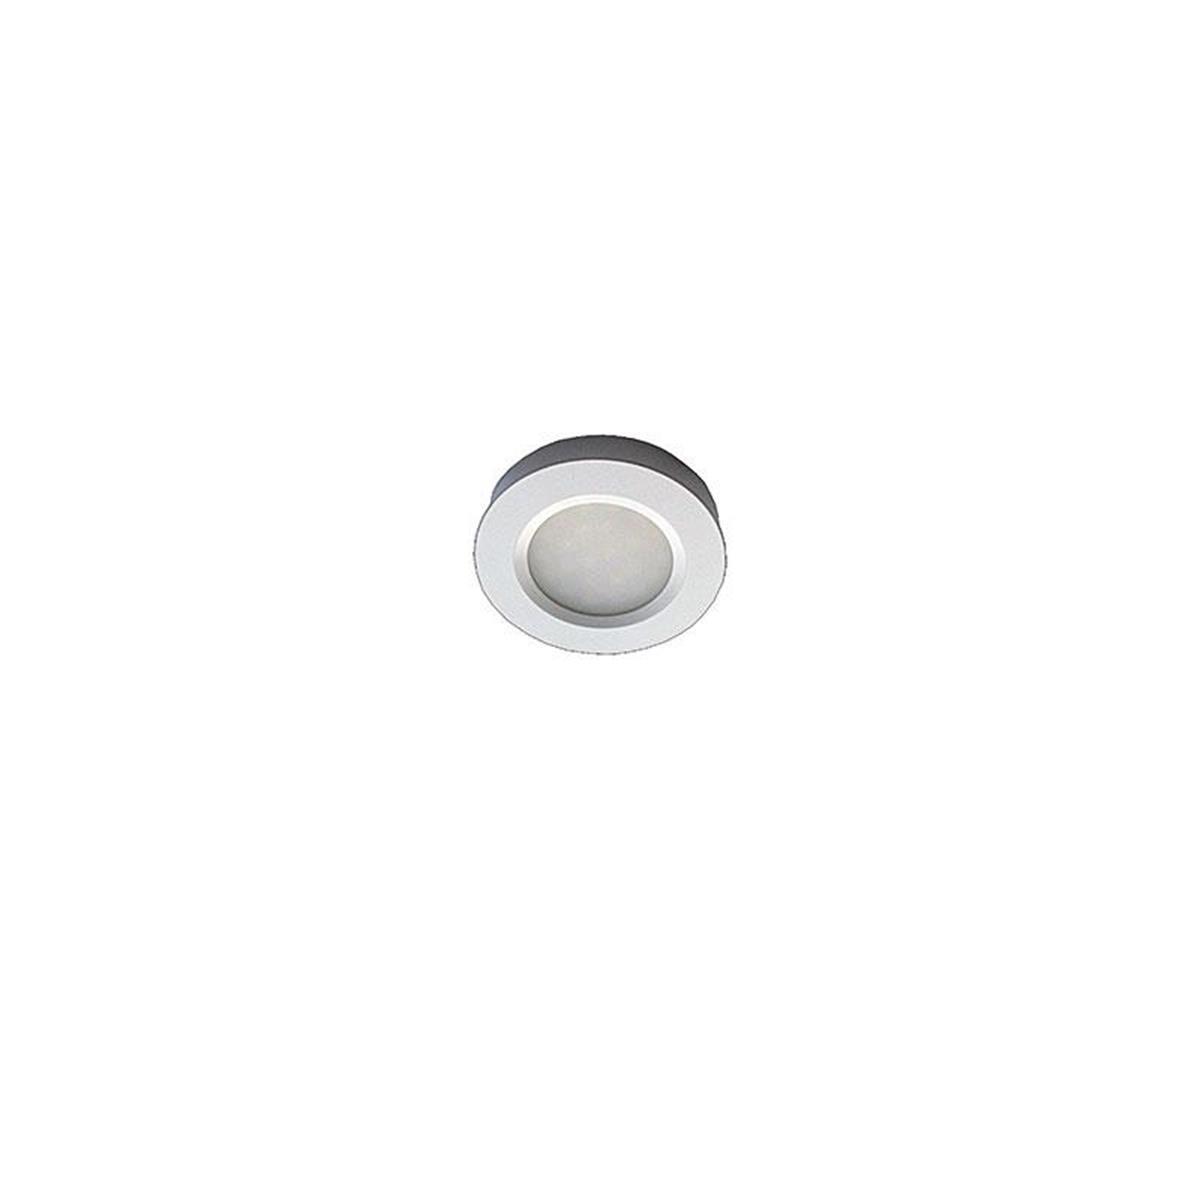 Takbelysning : Takbelysning infälld flux ab